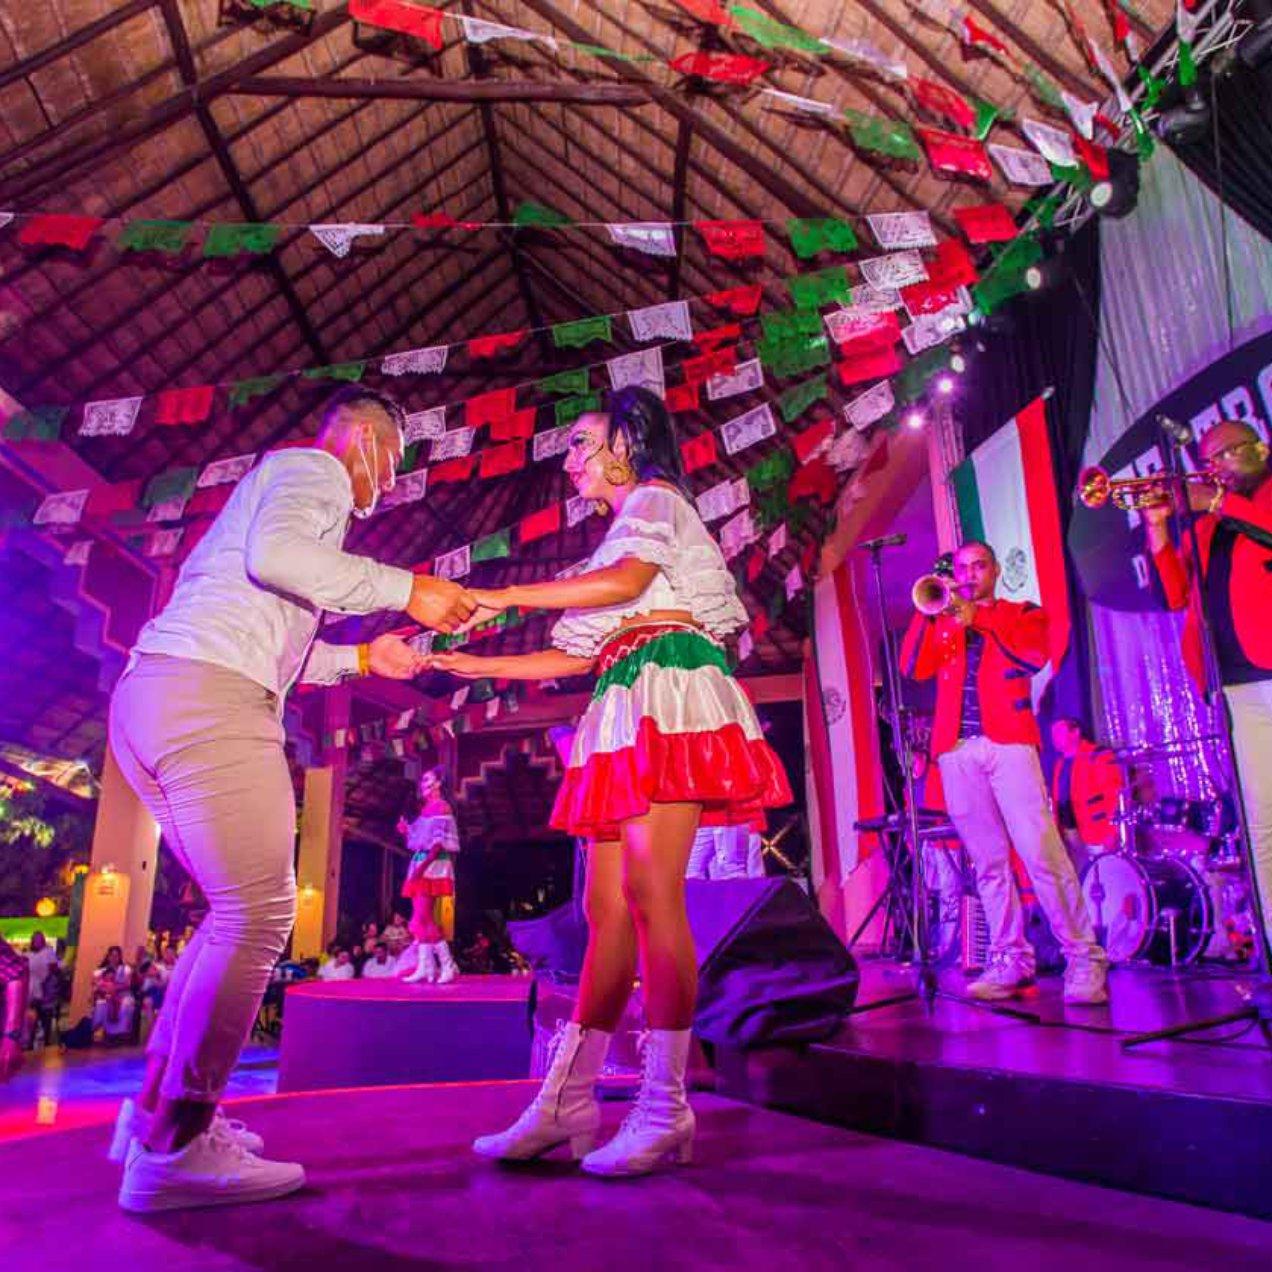 New Entertainment Program at Sandos Caracol: Vive Mexico